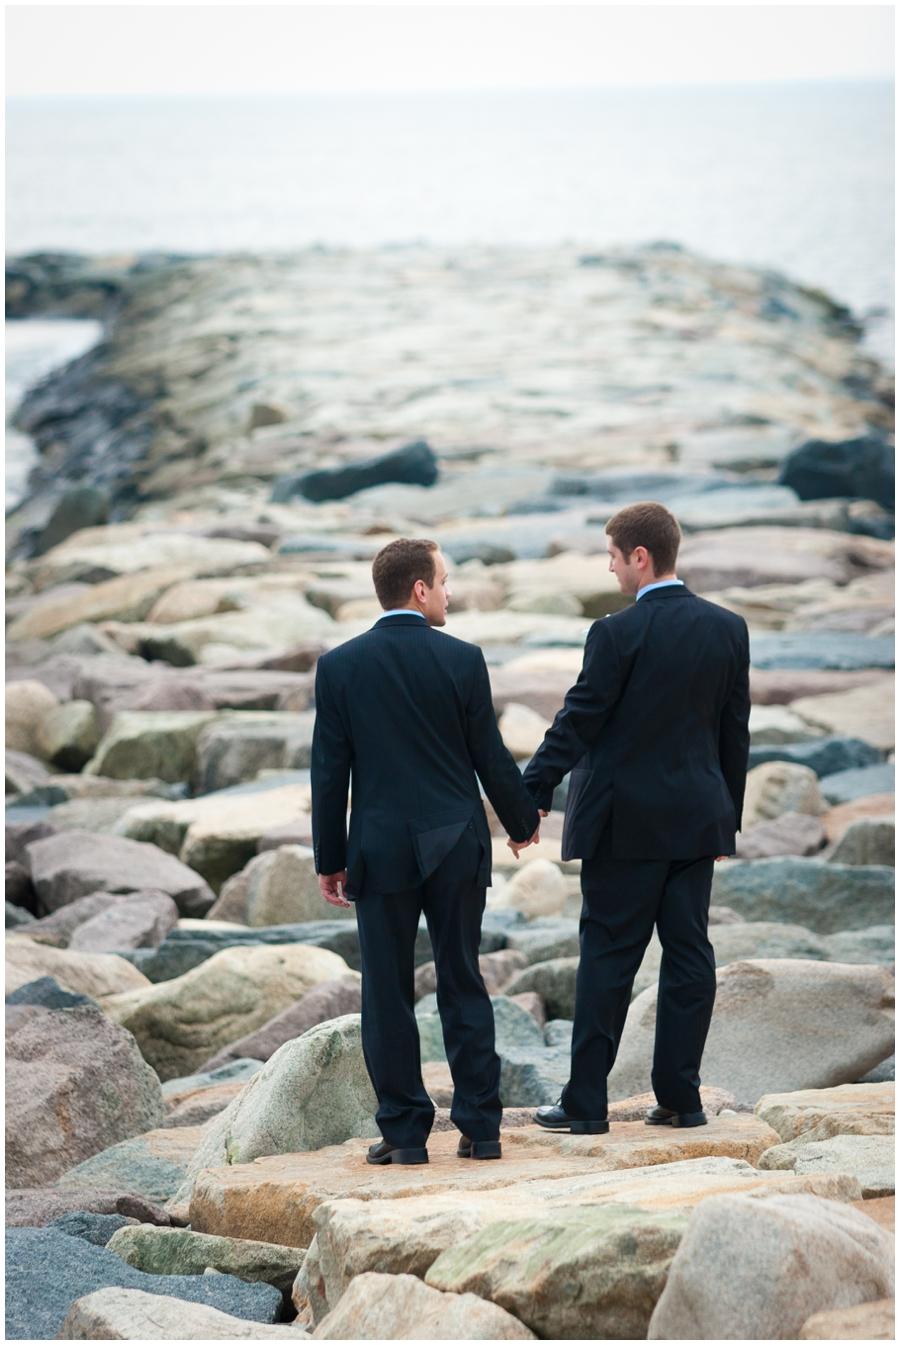 Scituate MA Lighthouse rocks couple Photograph - MA LGBT Destination Wedding Photographer